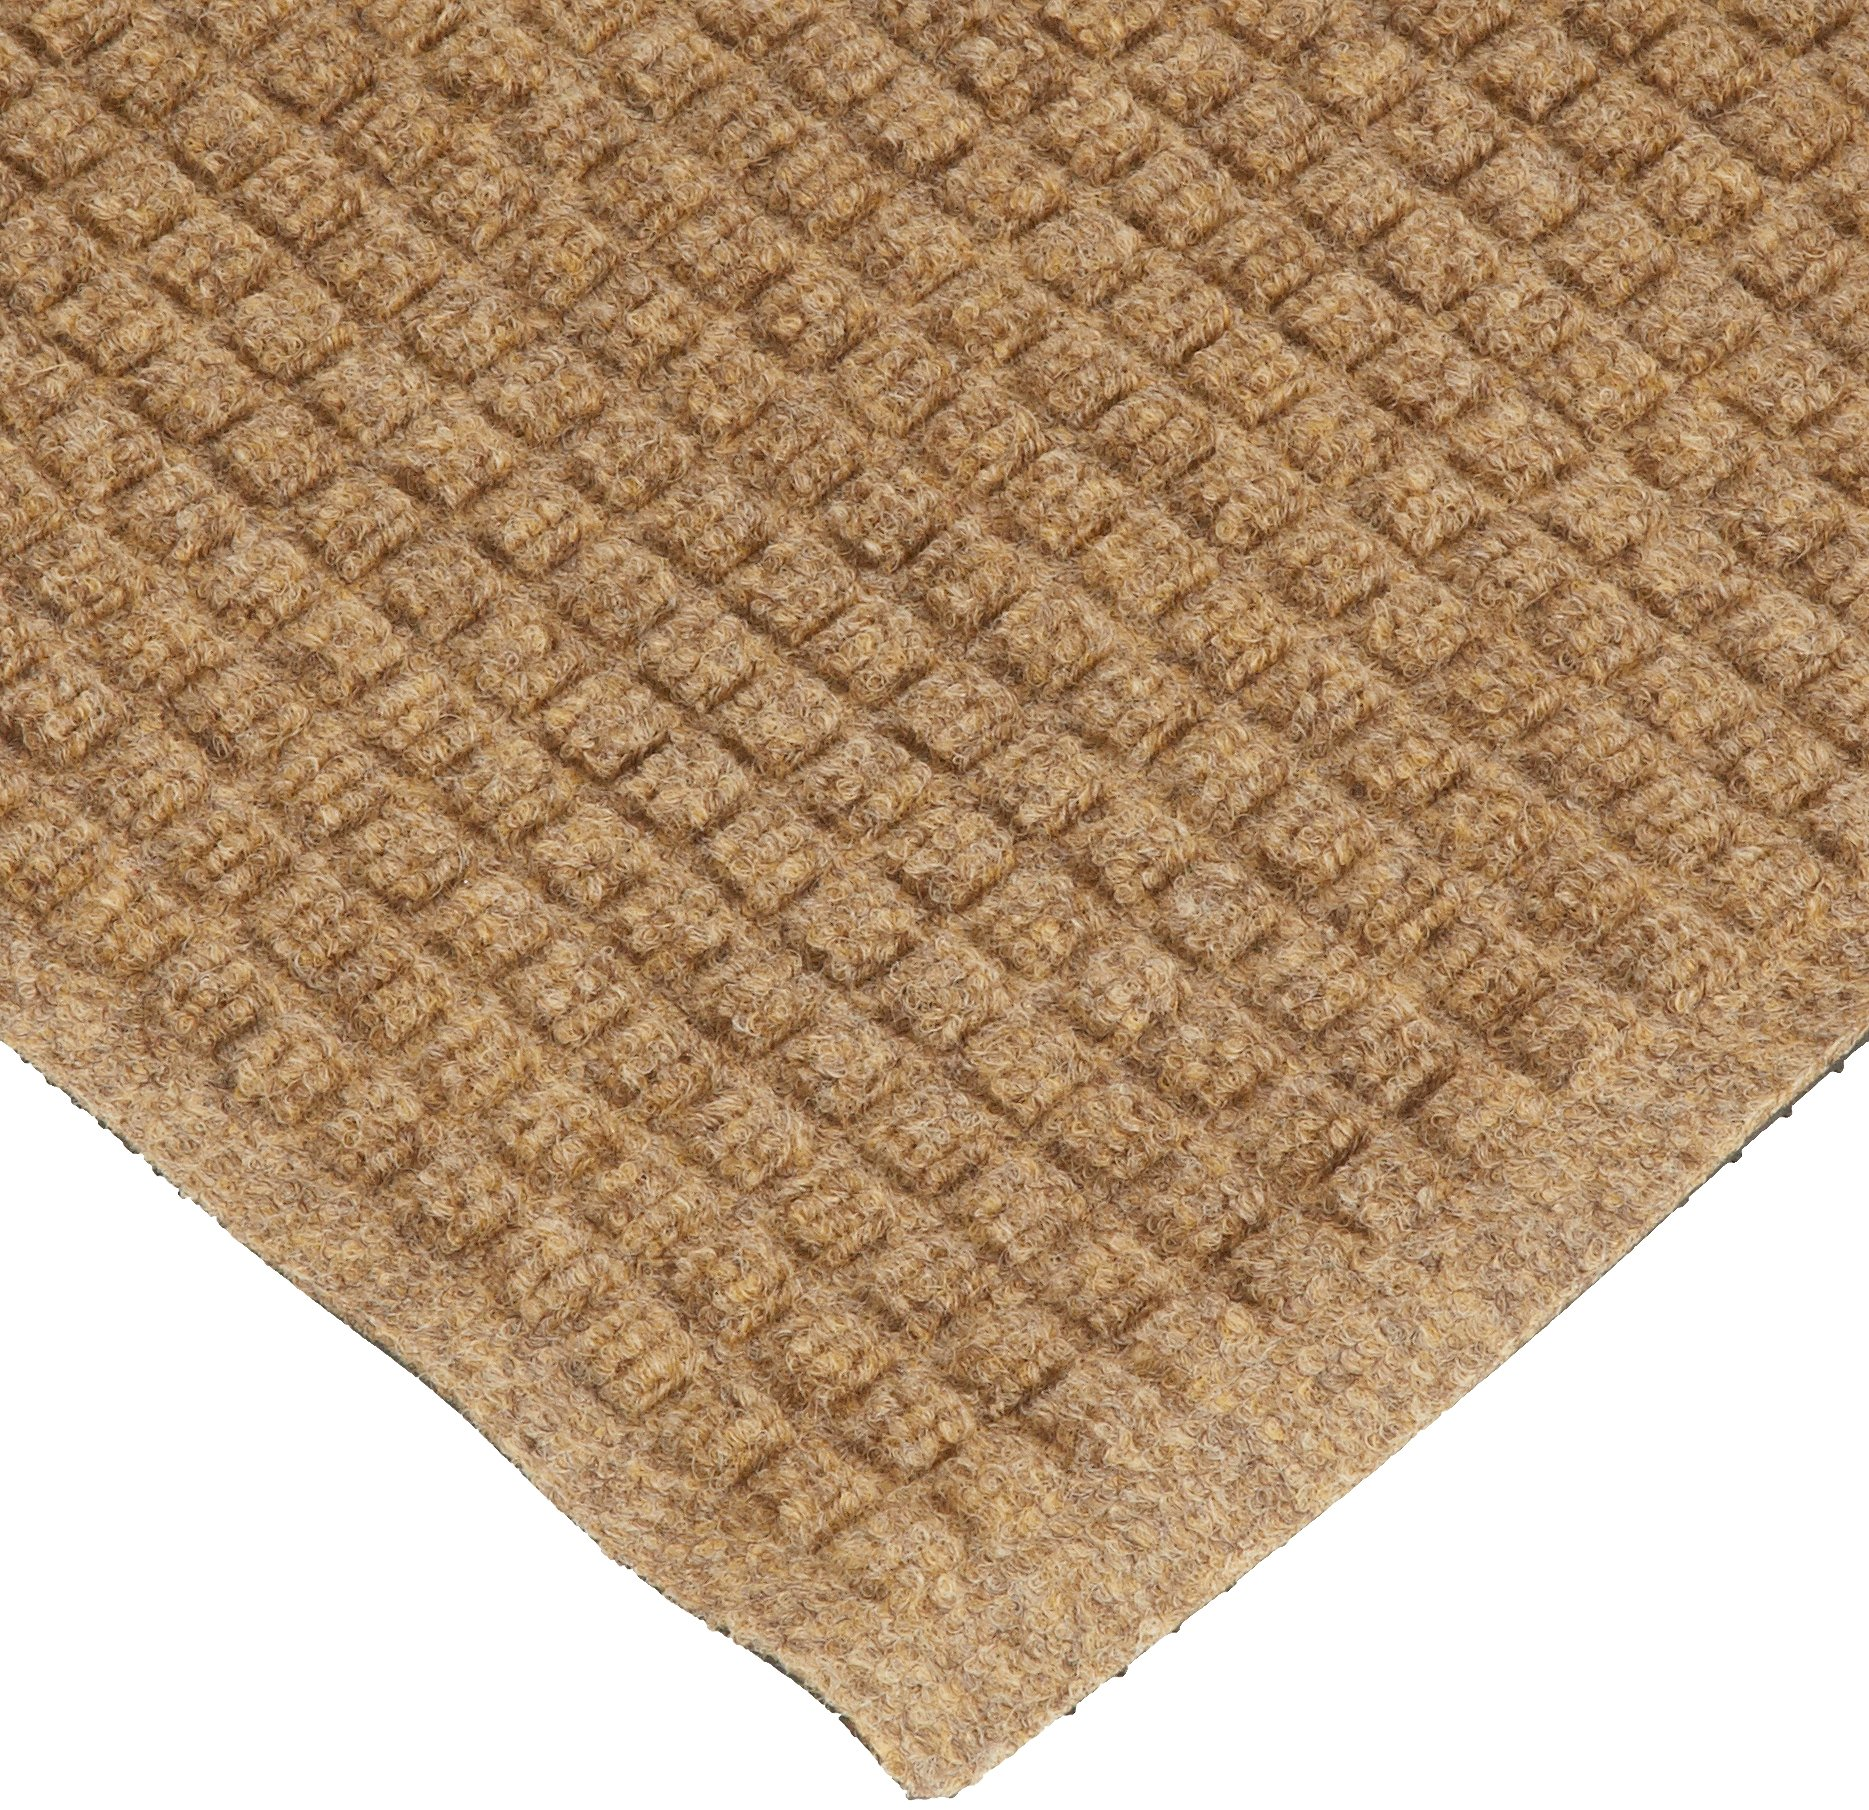 Andersen 250 WaterHog Drainable Polypropylene Entrance Outdoor Floor Mat, 10' Length x 3' Width, Camel by The Andersen Company (Image #1)